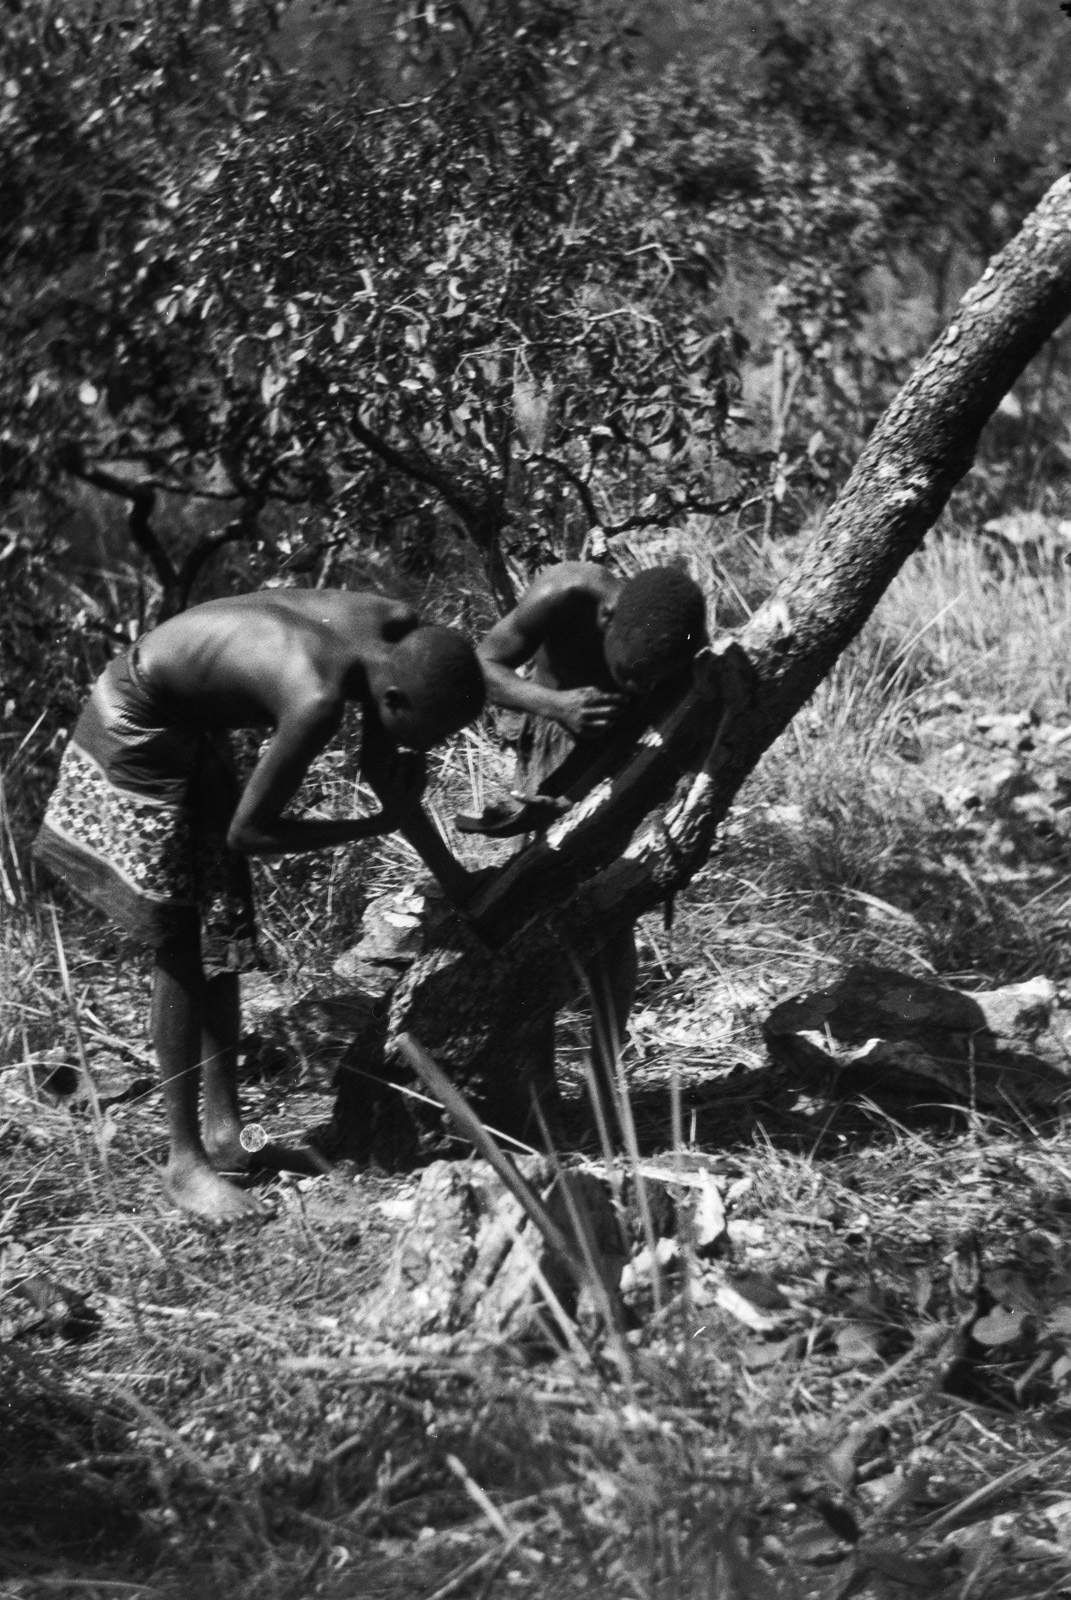 Между Капири Мпоши и рекой Лунсемфва. Двое мужчин собирают мед из улья диких пчел.